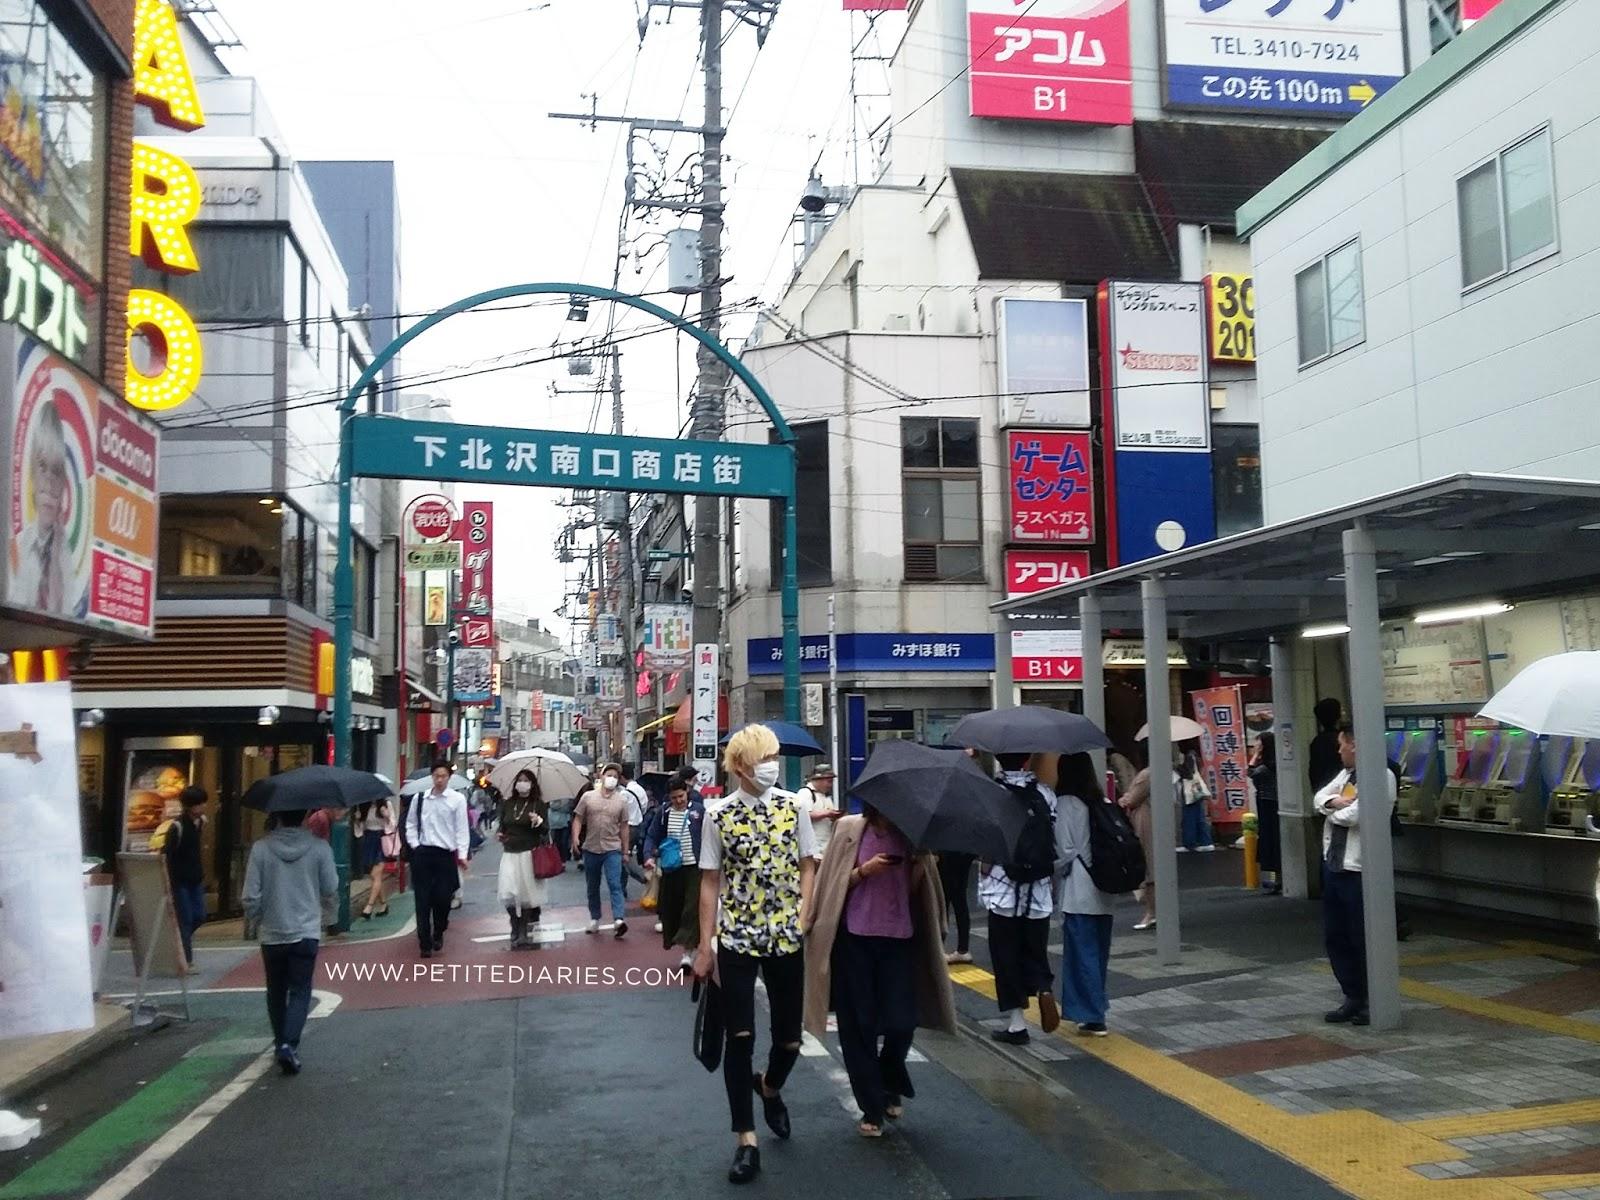 SHIMOKITAZAWA 下北沢 shopping